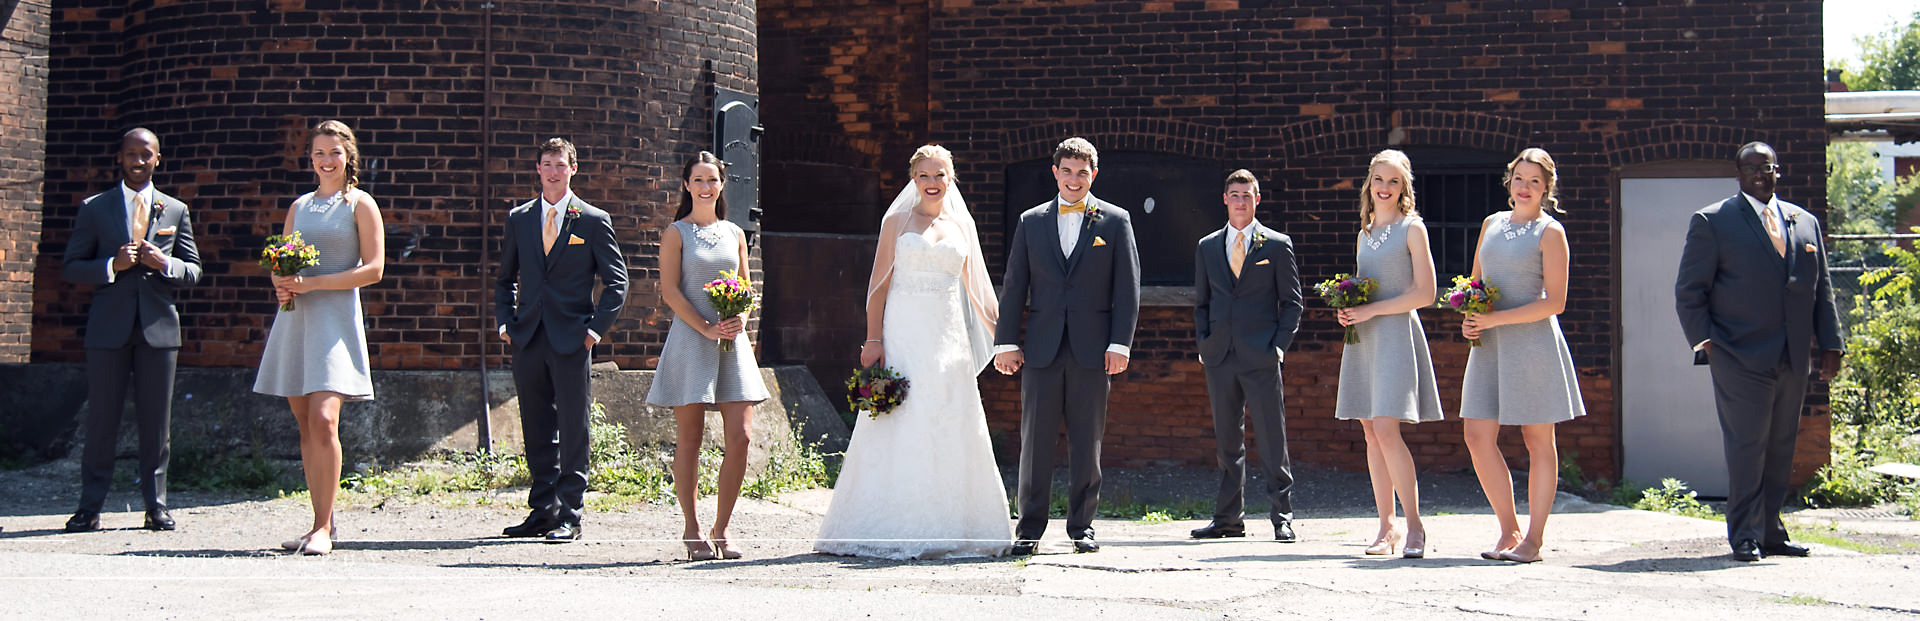 Hamilton_Wedding_Photography_22